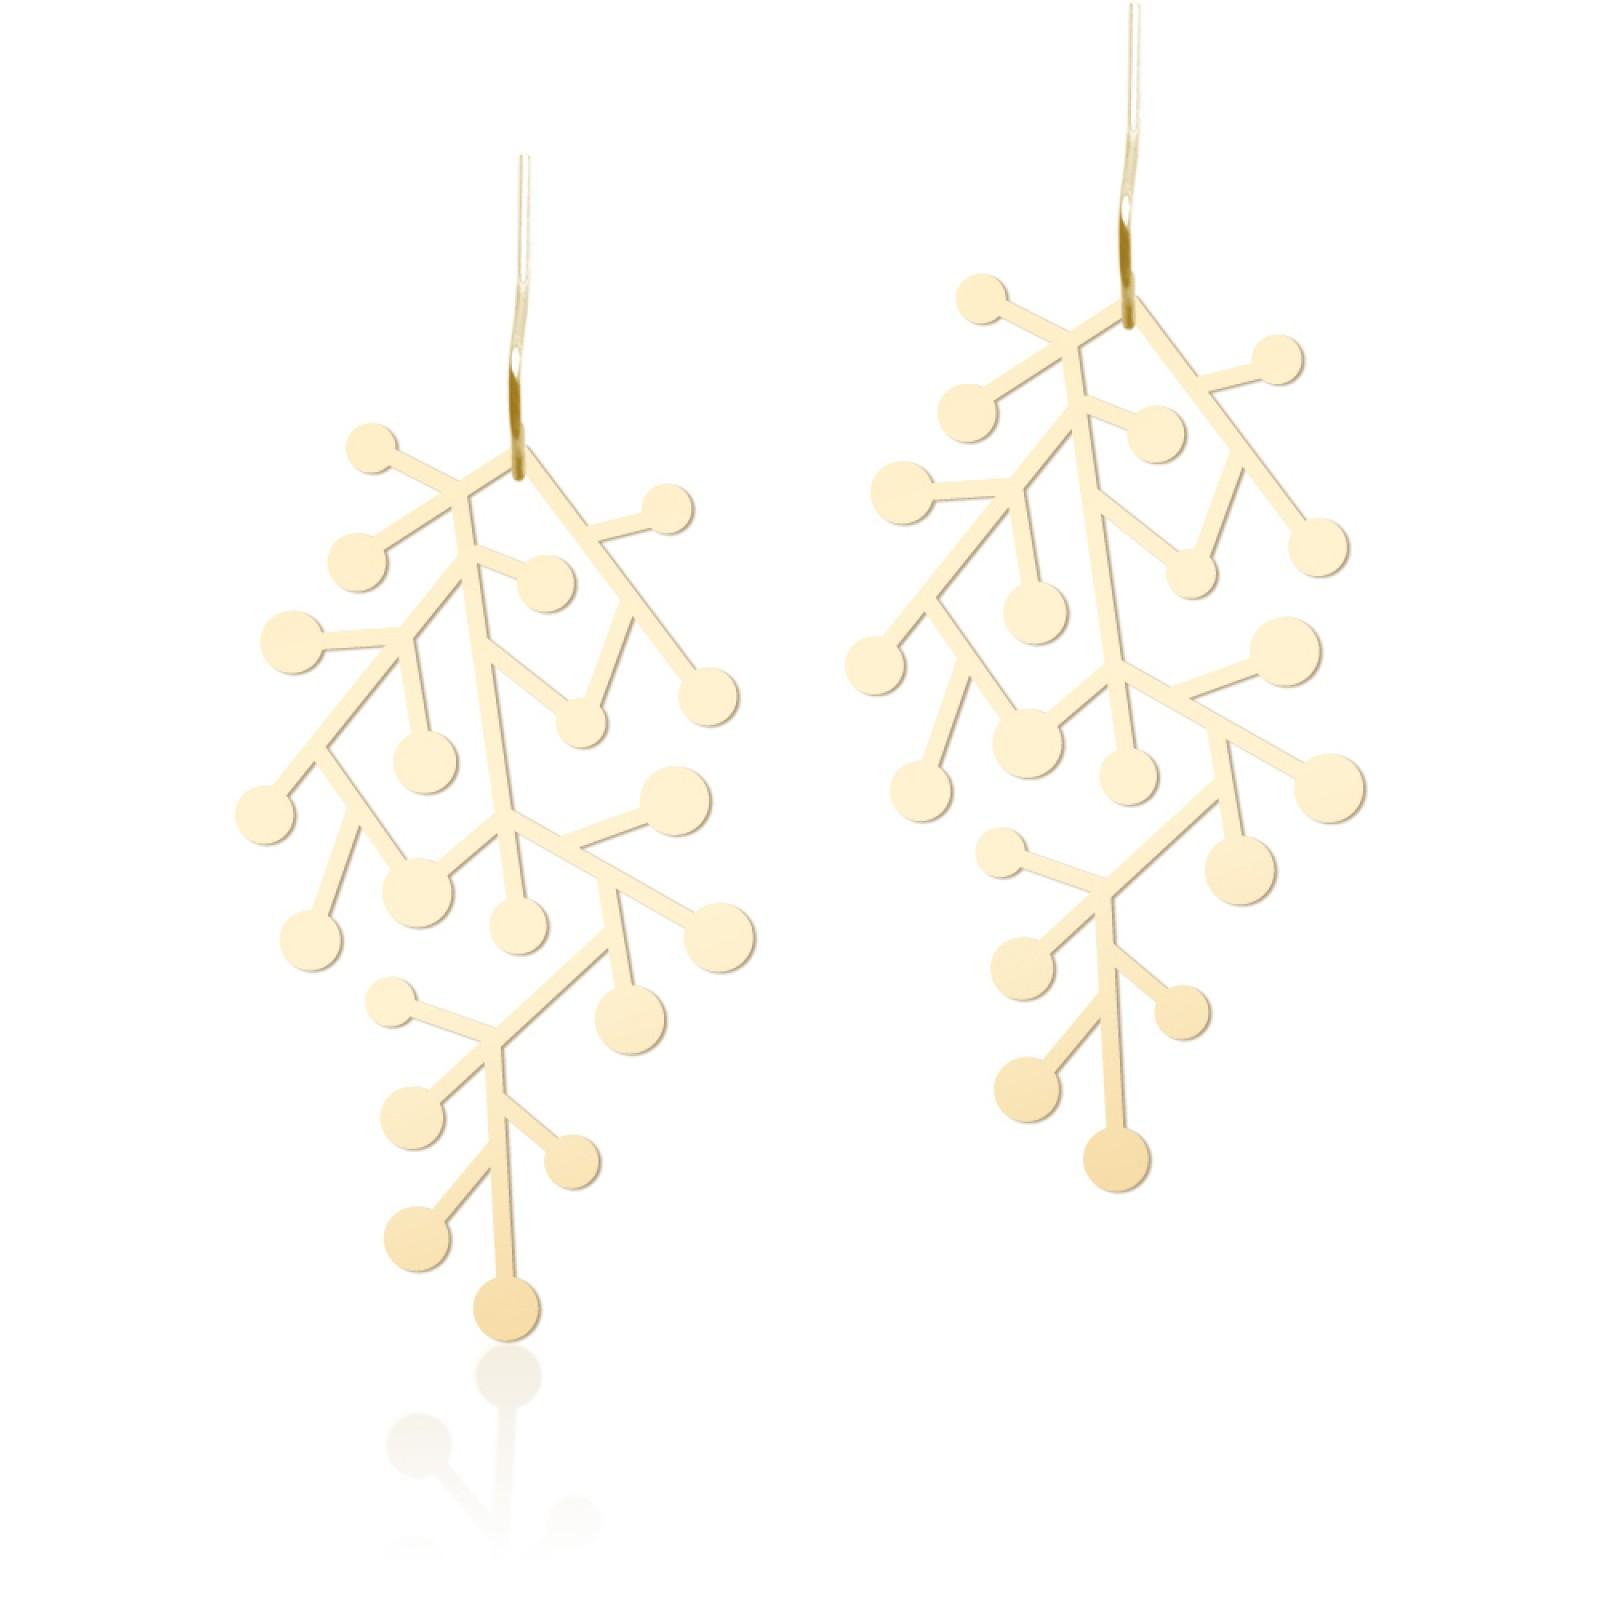 Snow Days Earrings S (Gold) - Moorigin